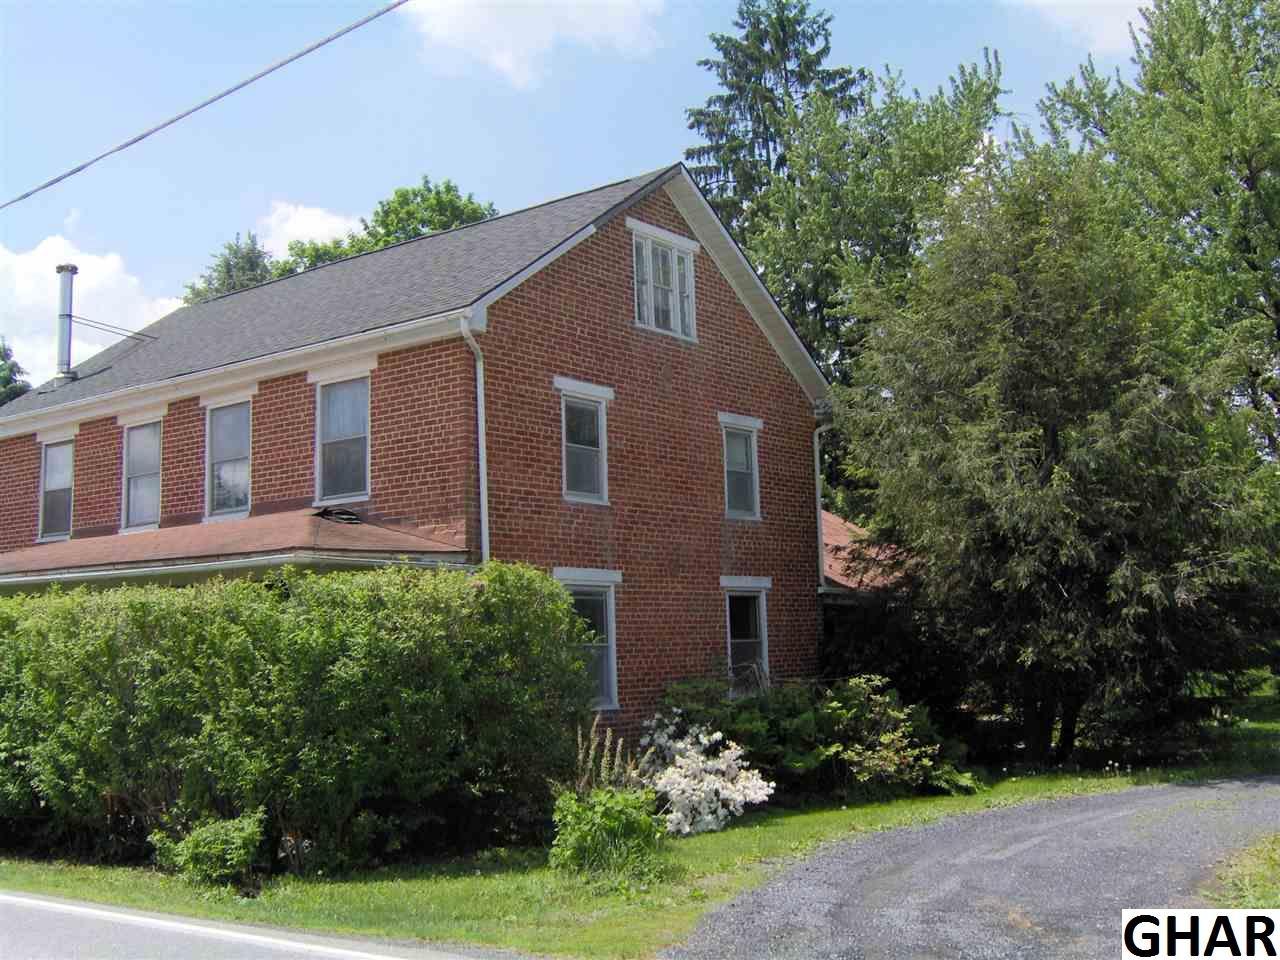 18 S York Rd, Dillsburg, PA 17019